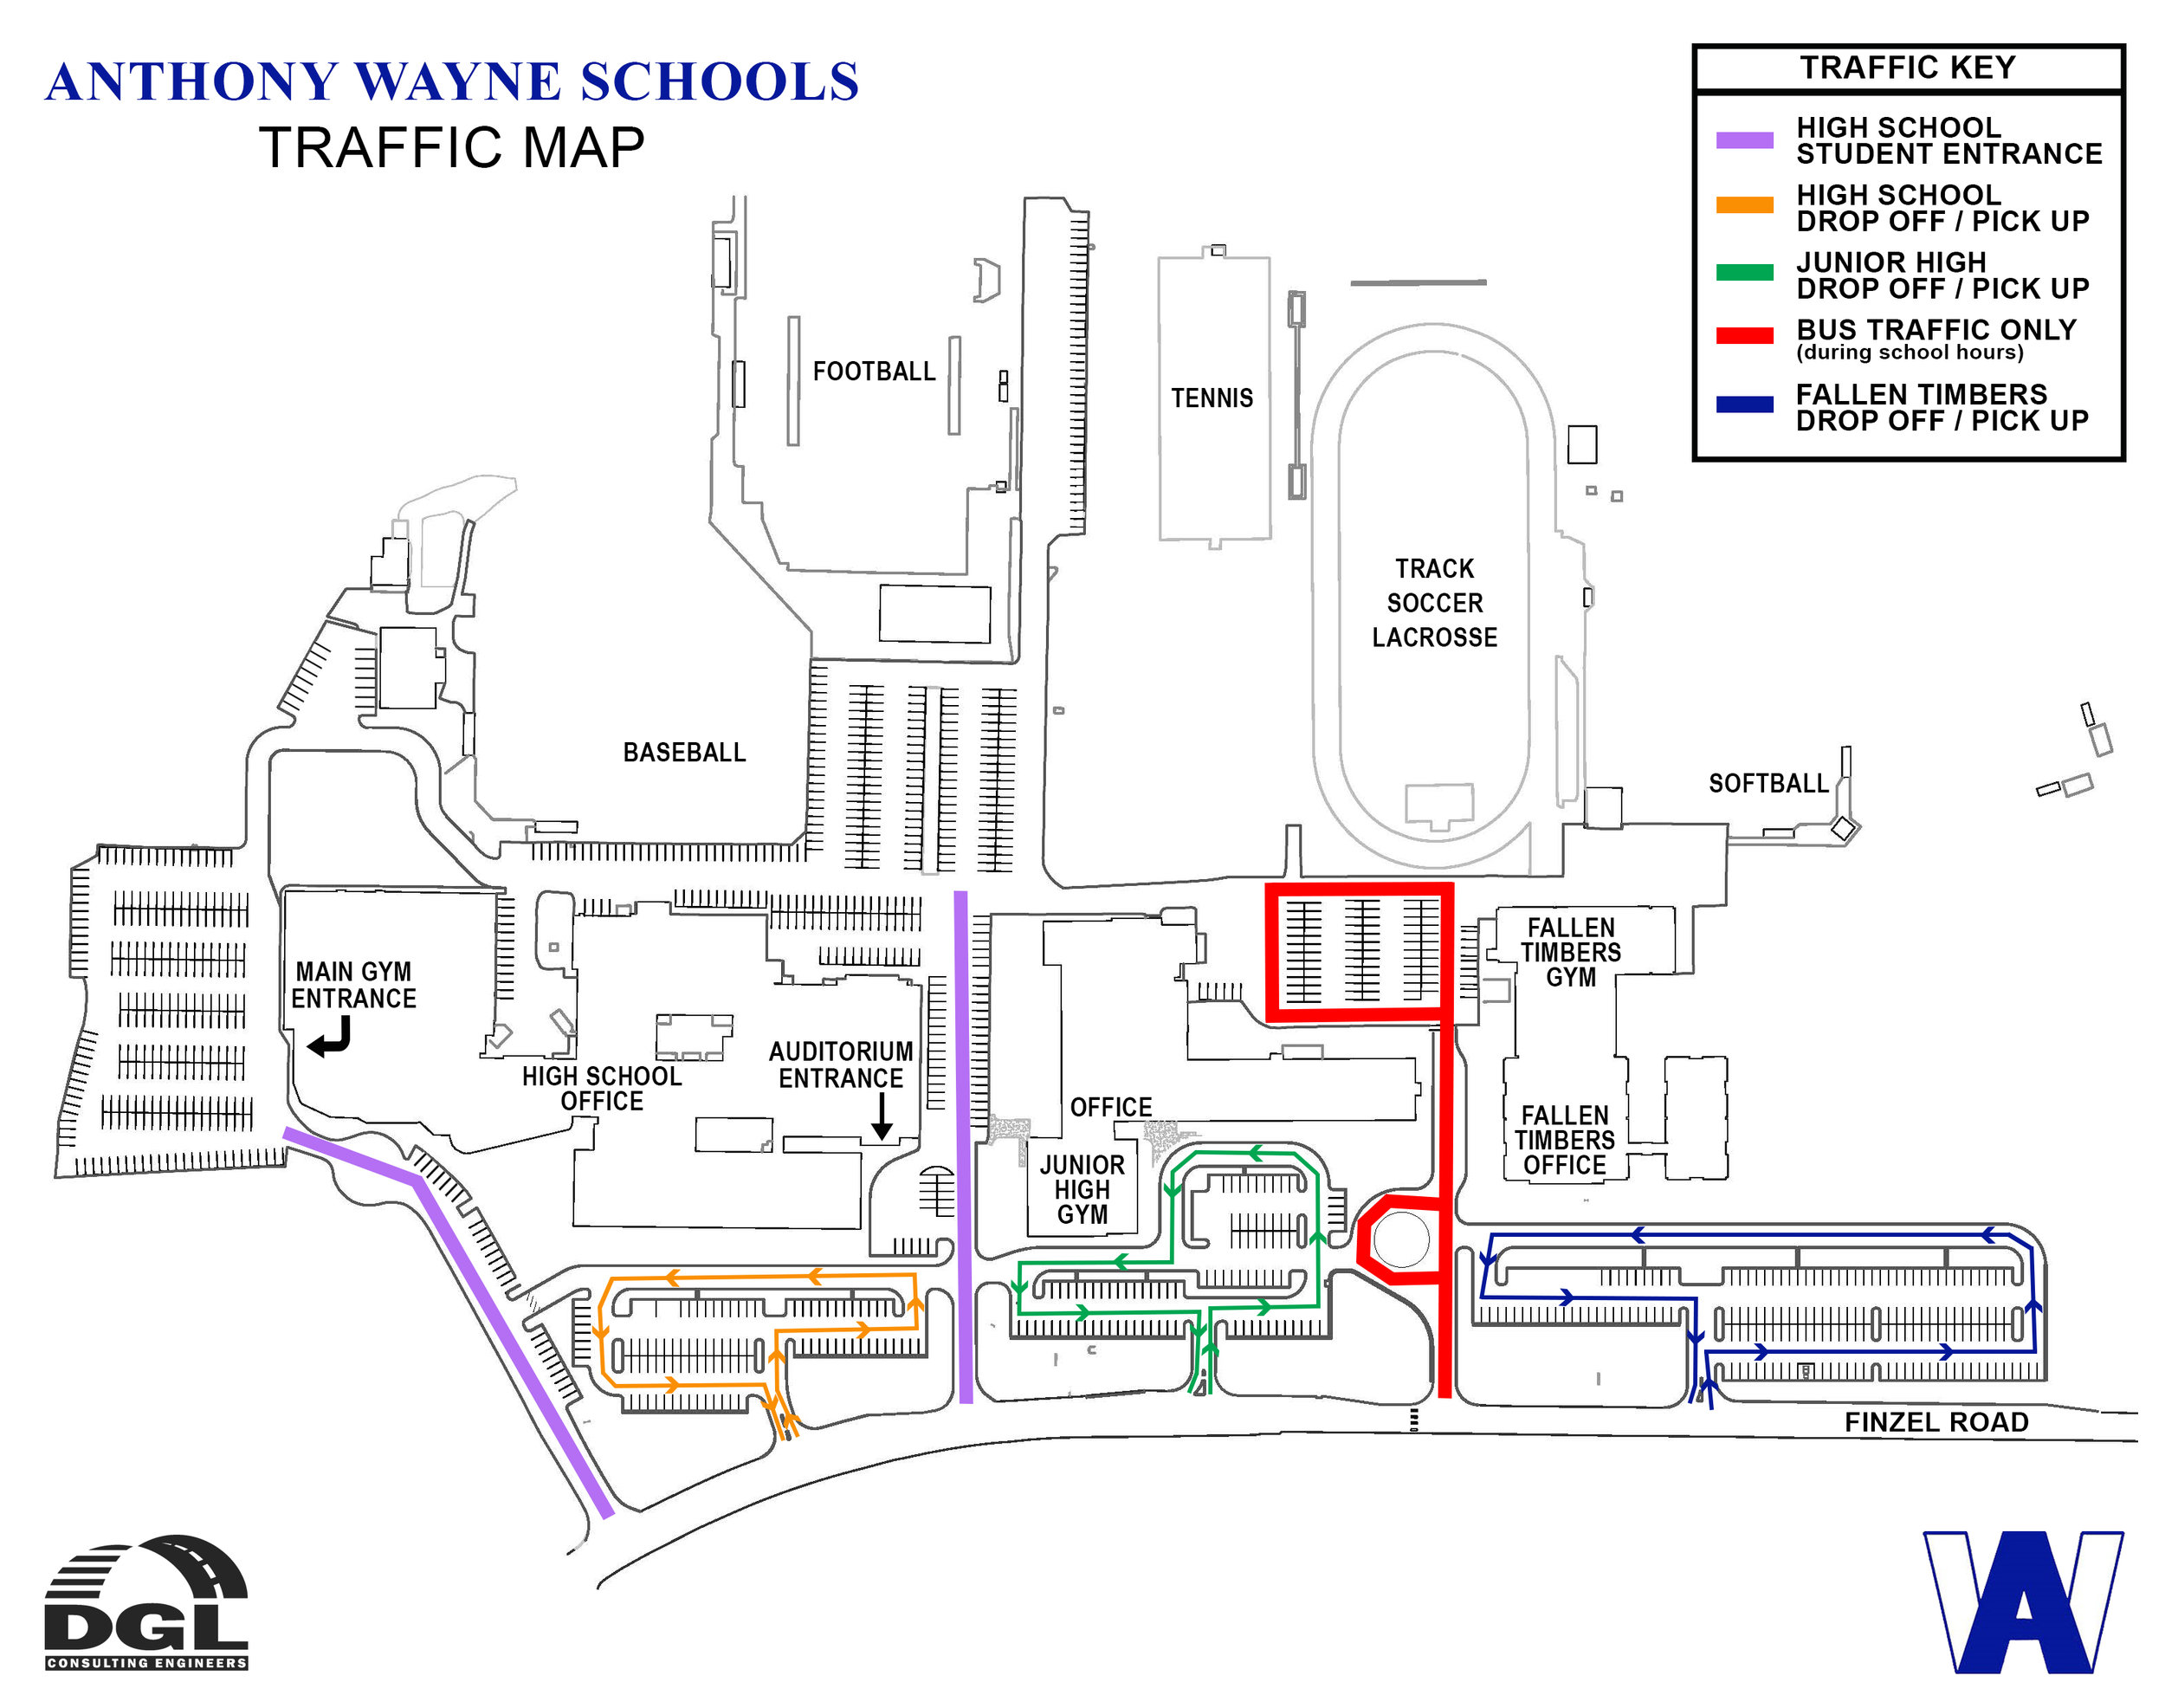 Anthony Wayne Schools Traffic Map.jpg